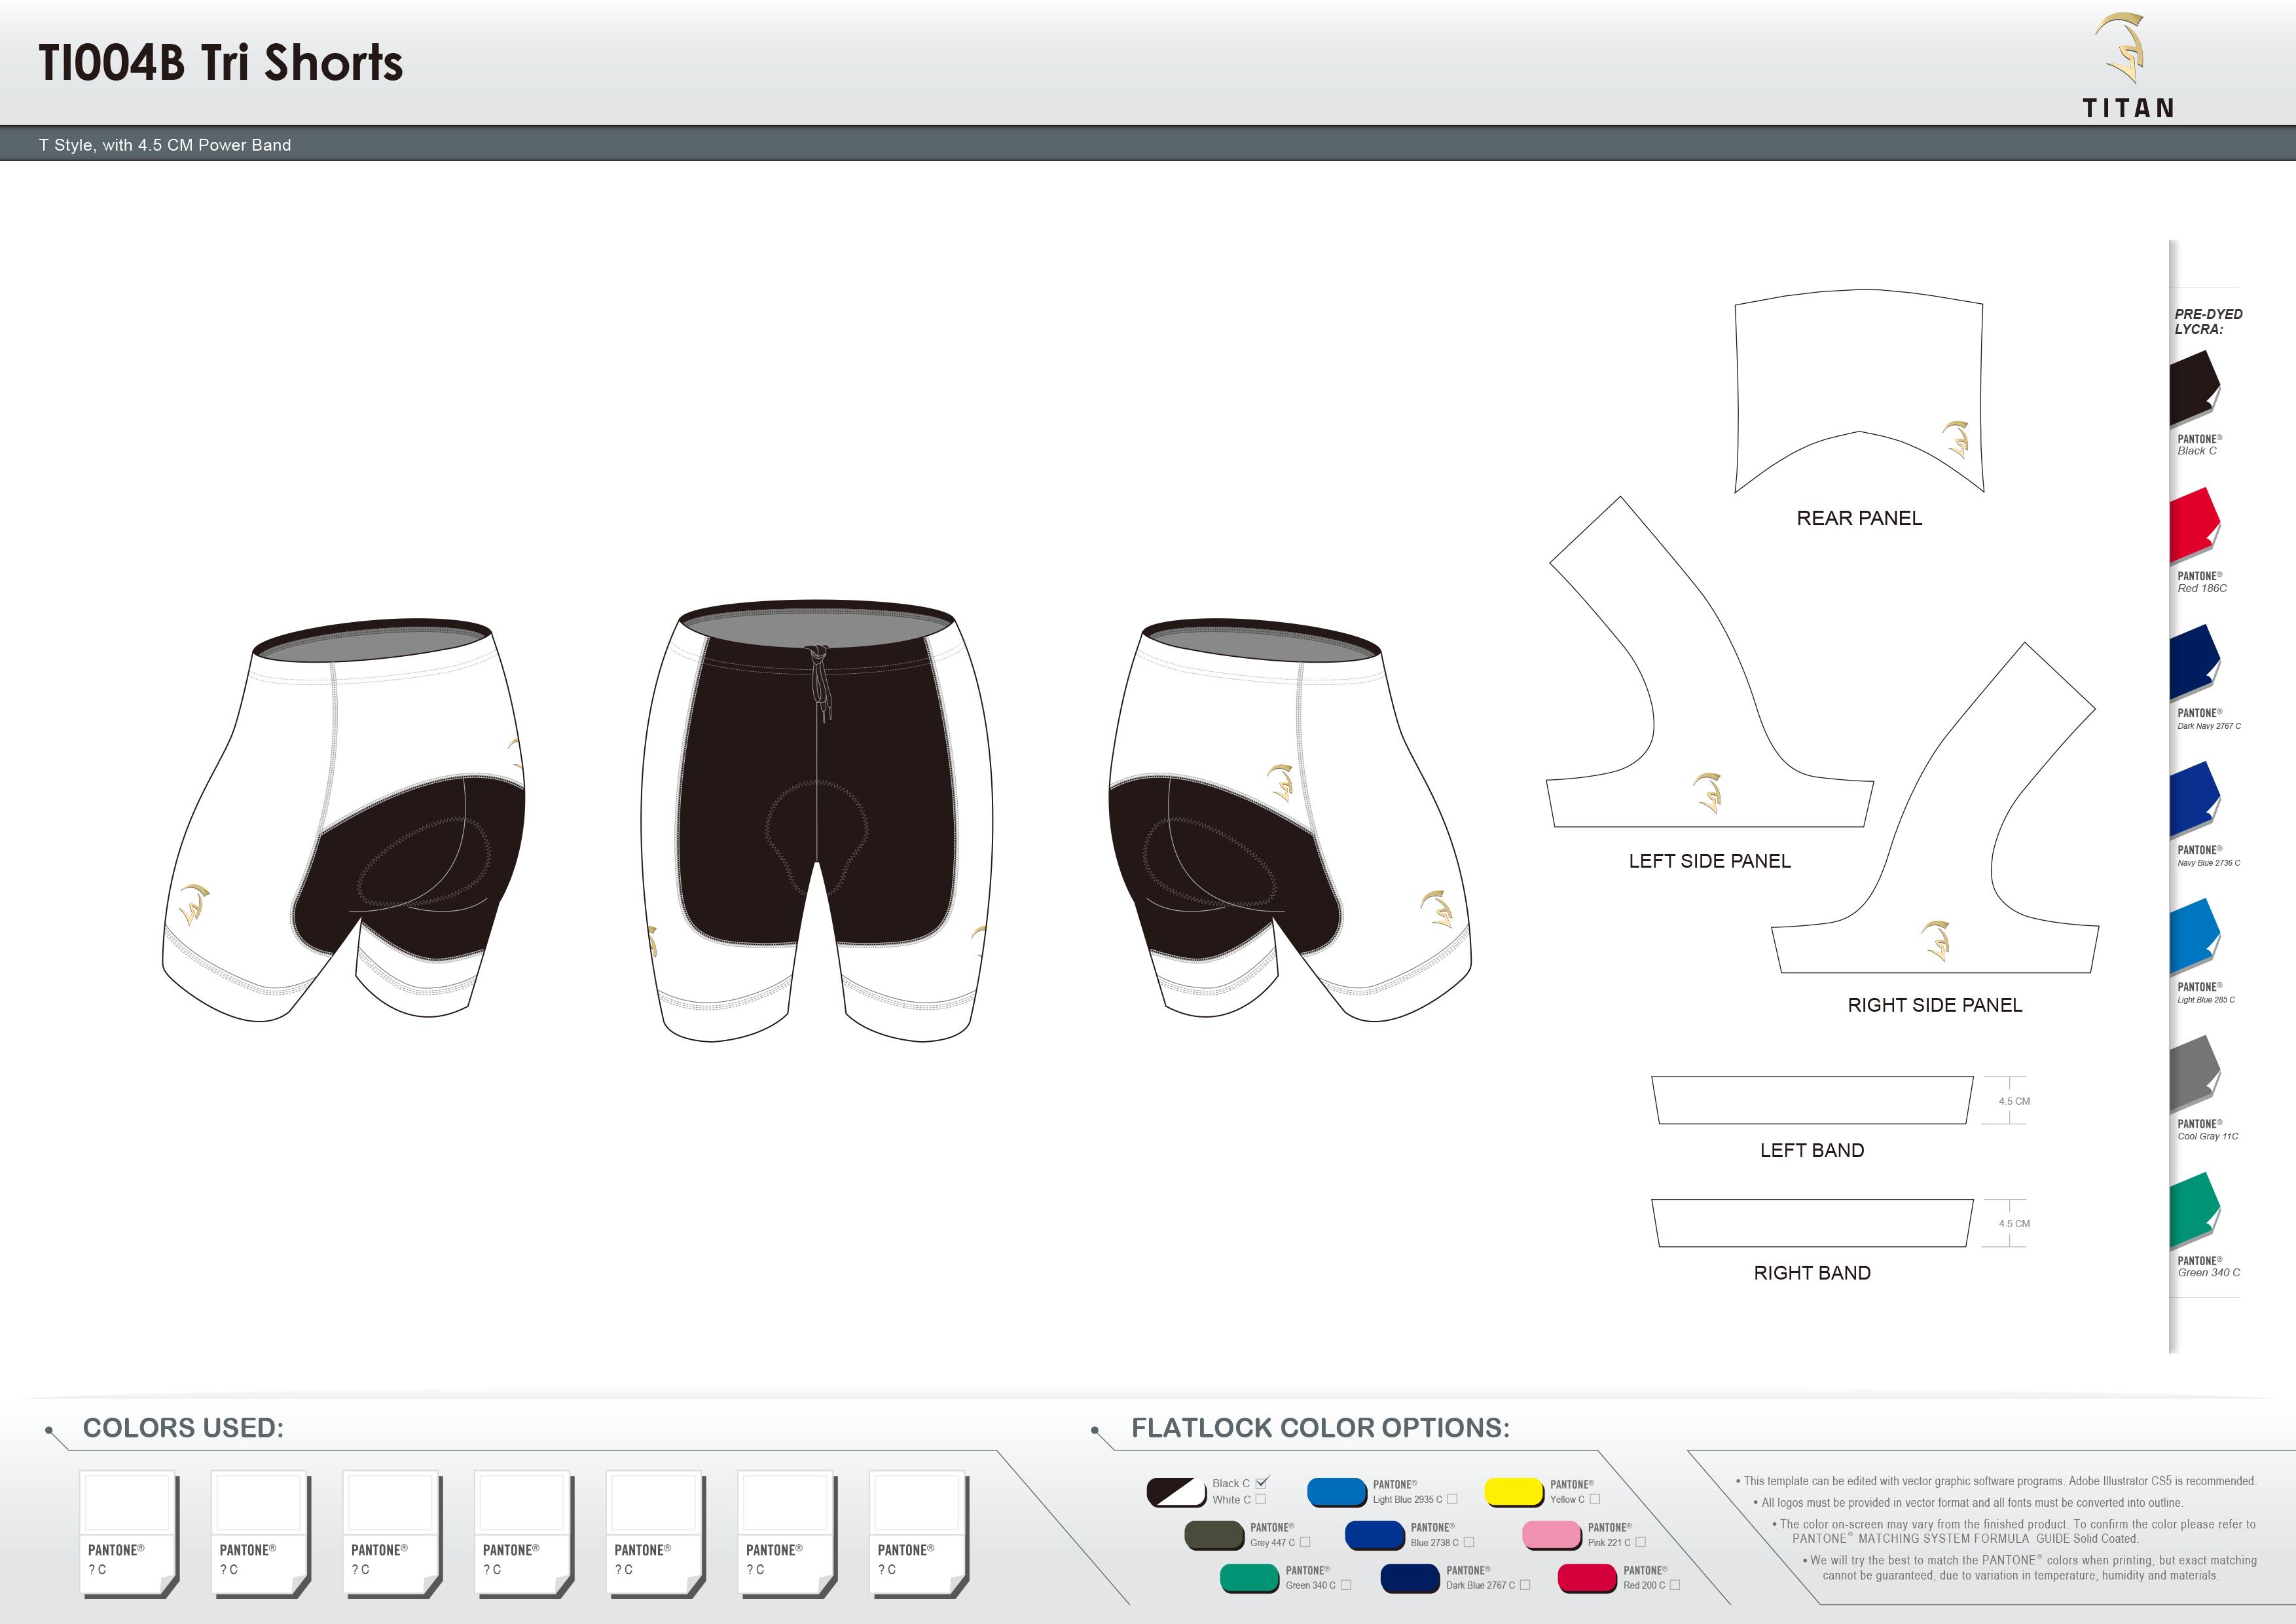 TI004B Tri Shorts